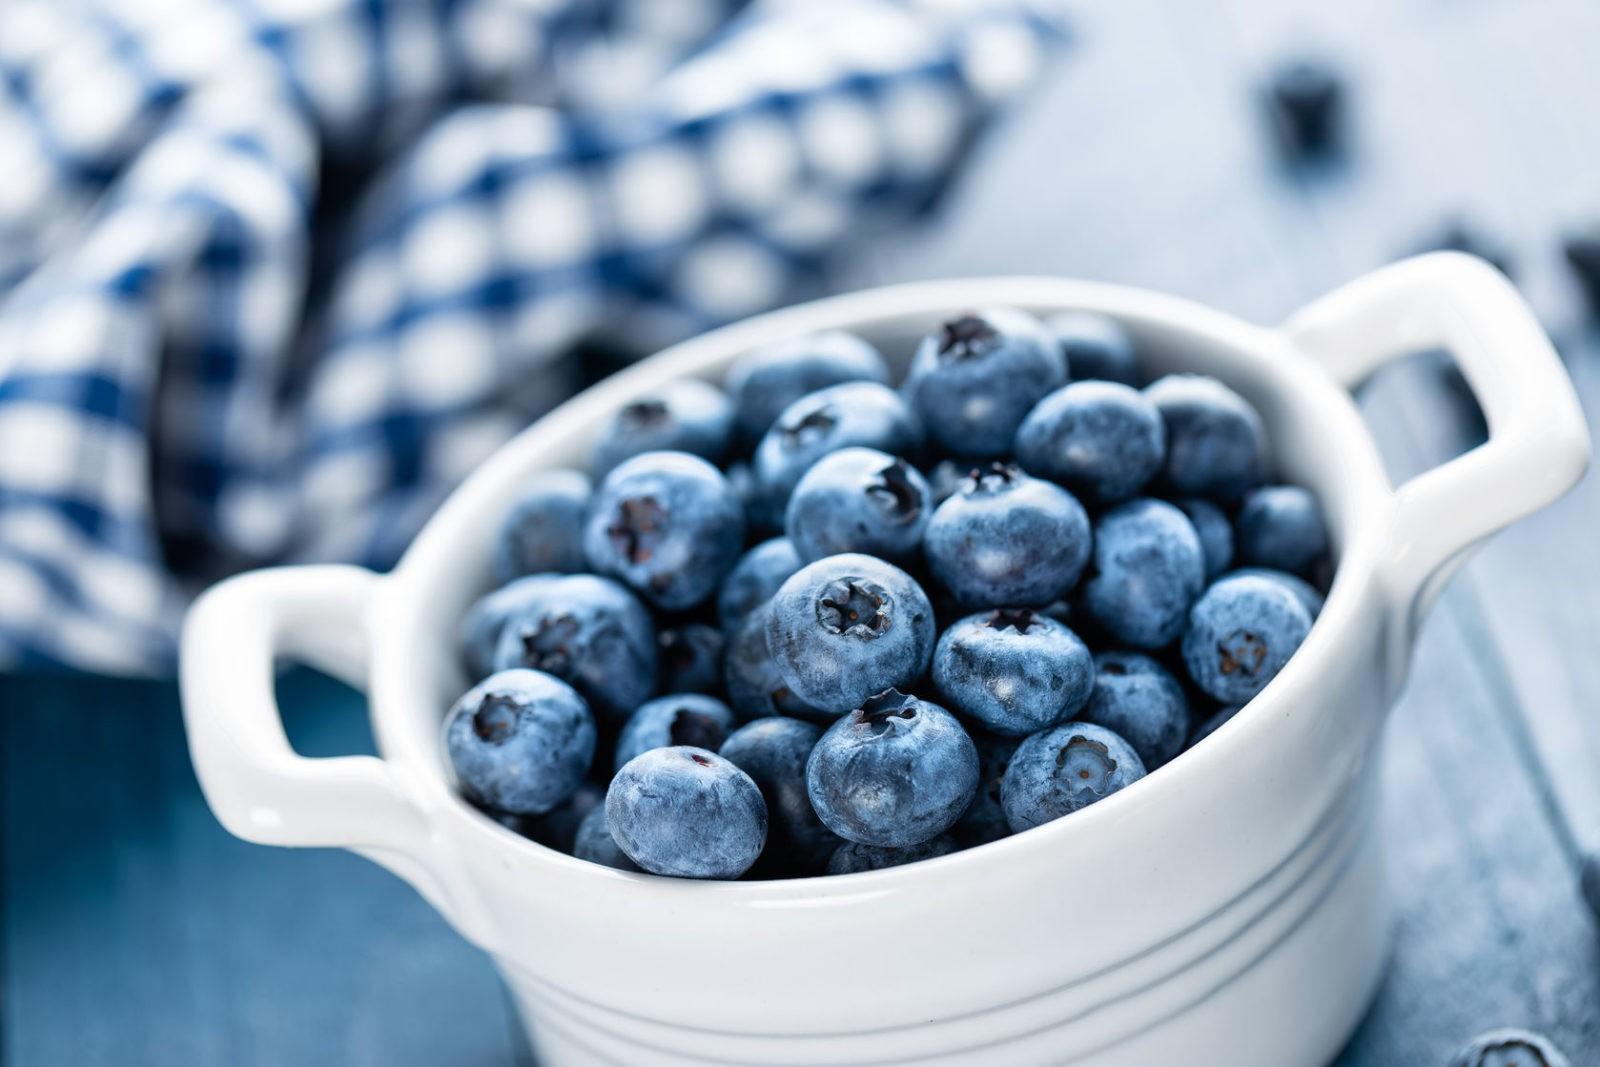 DIY blueberry face mask recipe